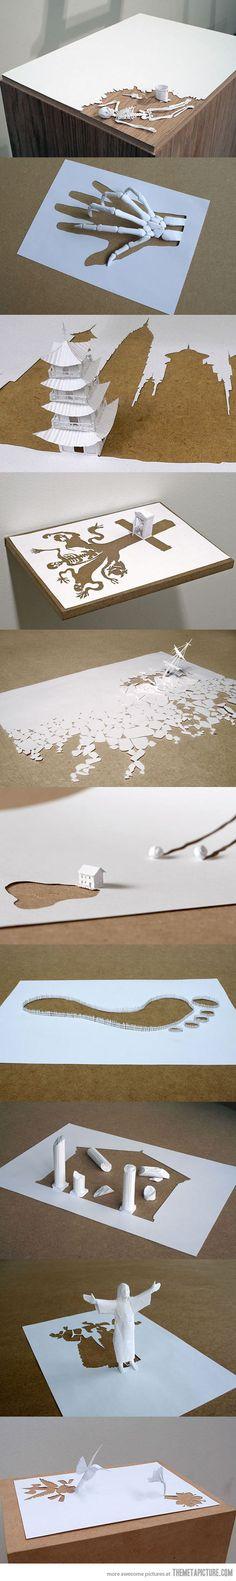 Amazing paper art by Peter Callesen…